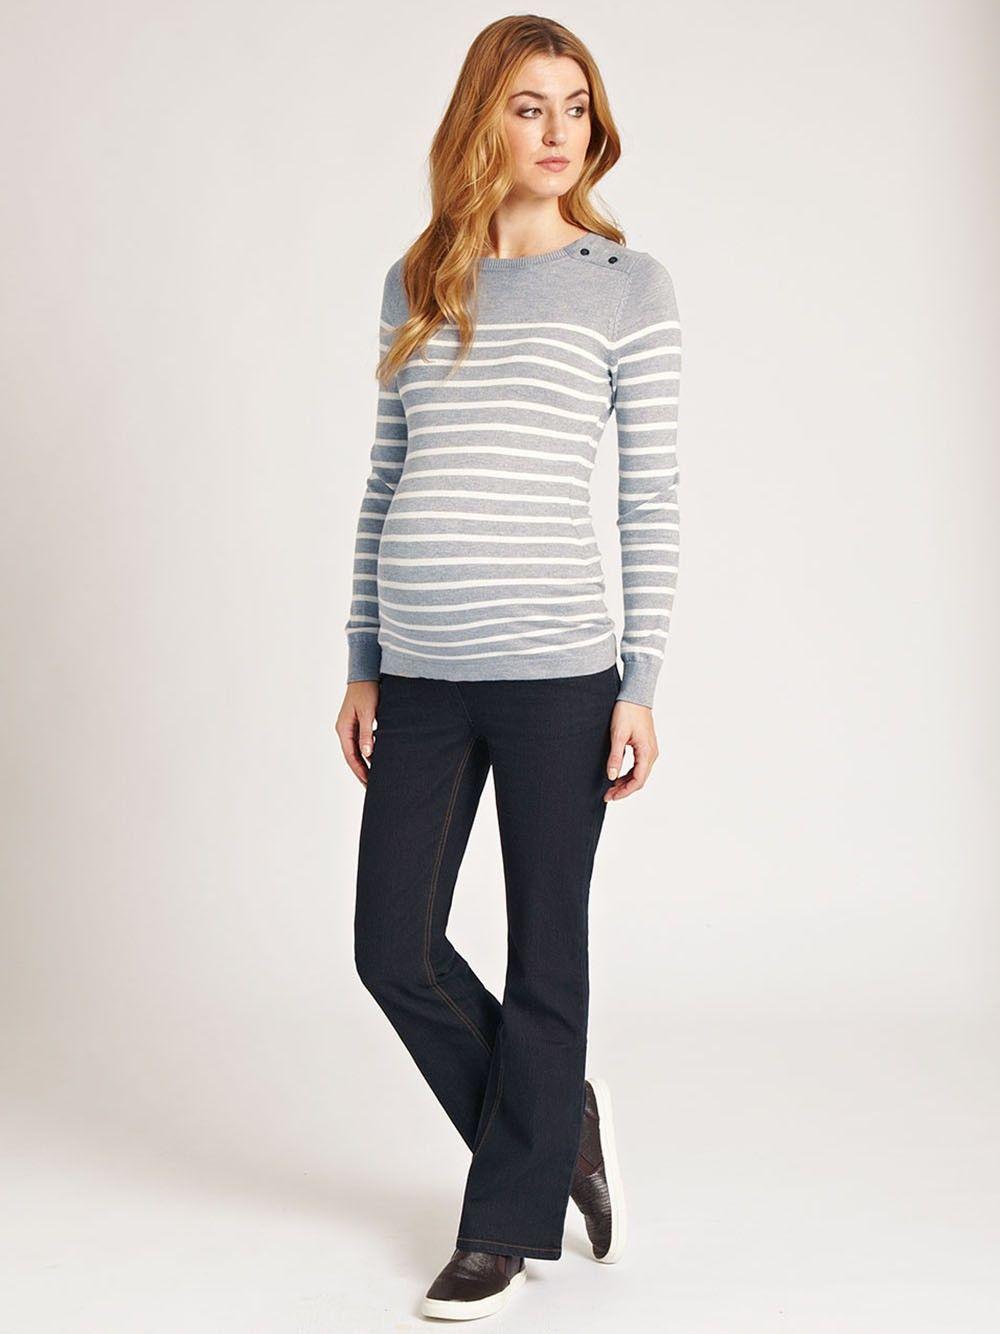 72f690ae4365c Breton Stripe Maternity Sweater | Riided | Maternity sweater ...